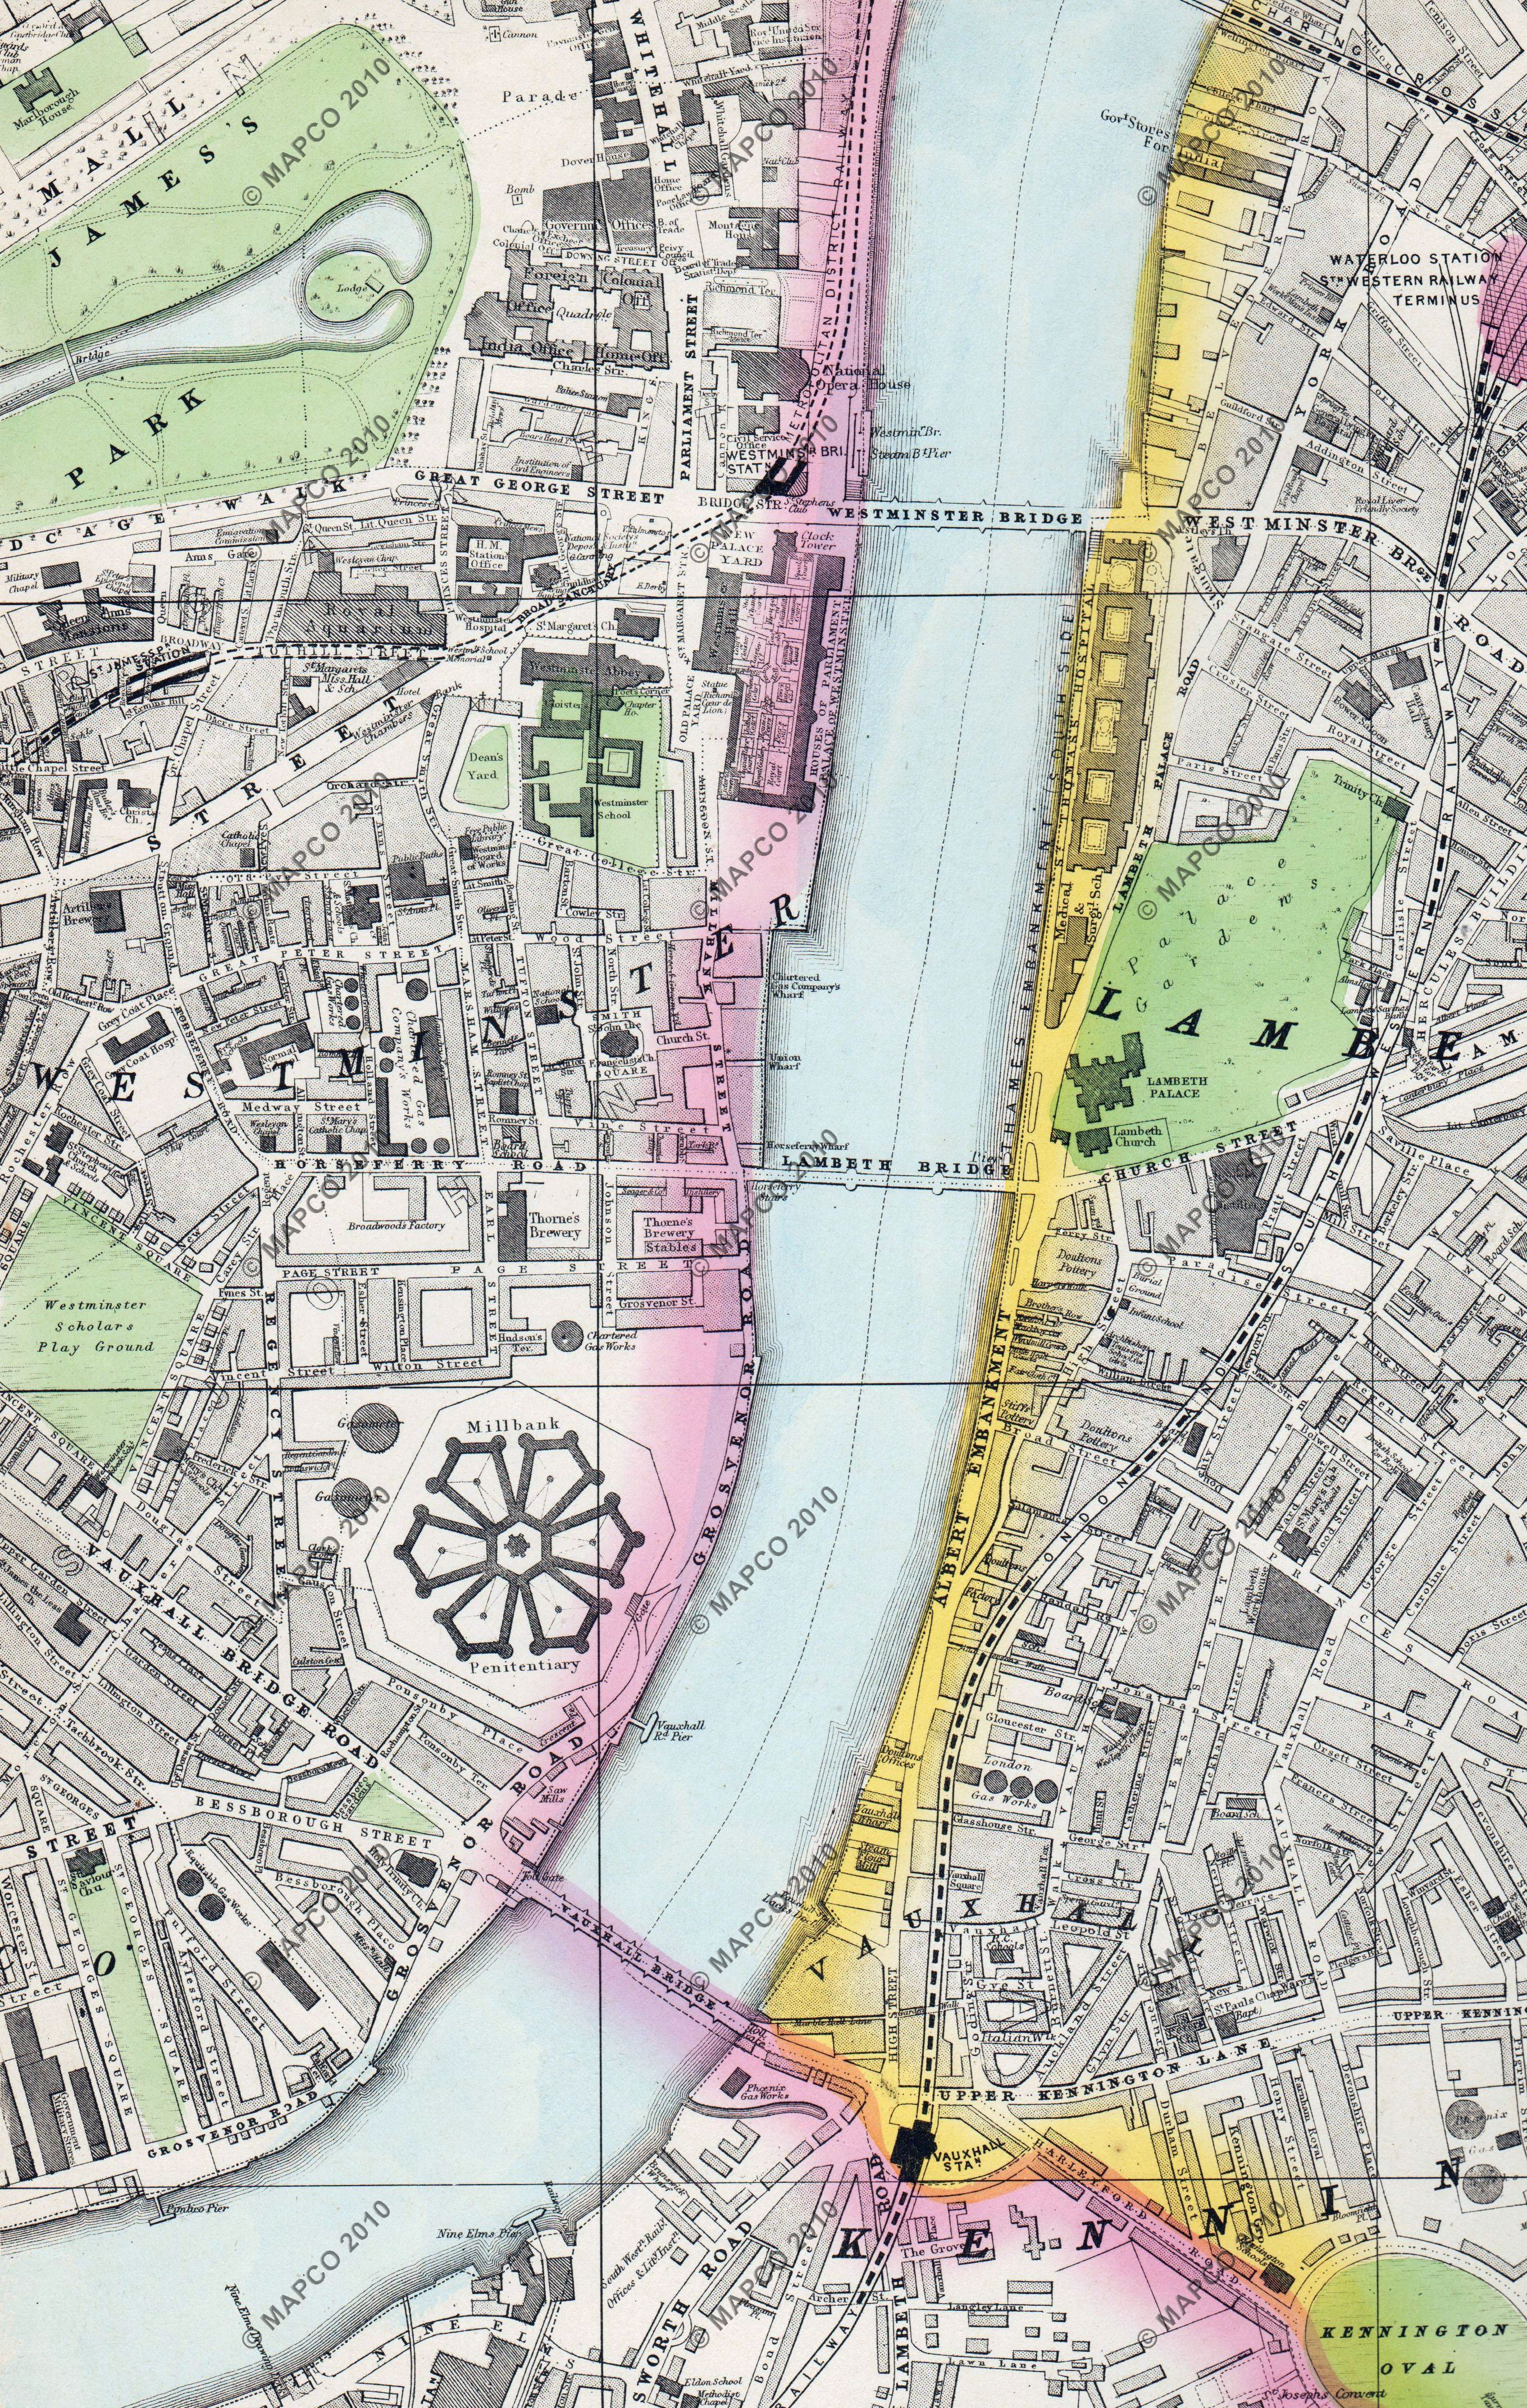 London Atlas Map.Map Of London 1880 Bacon S Large Scale Atlas